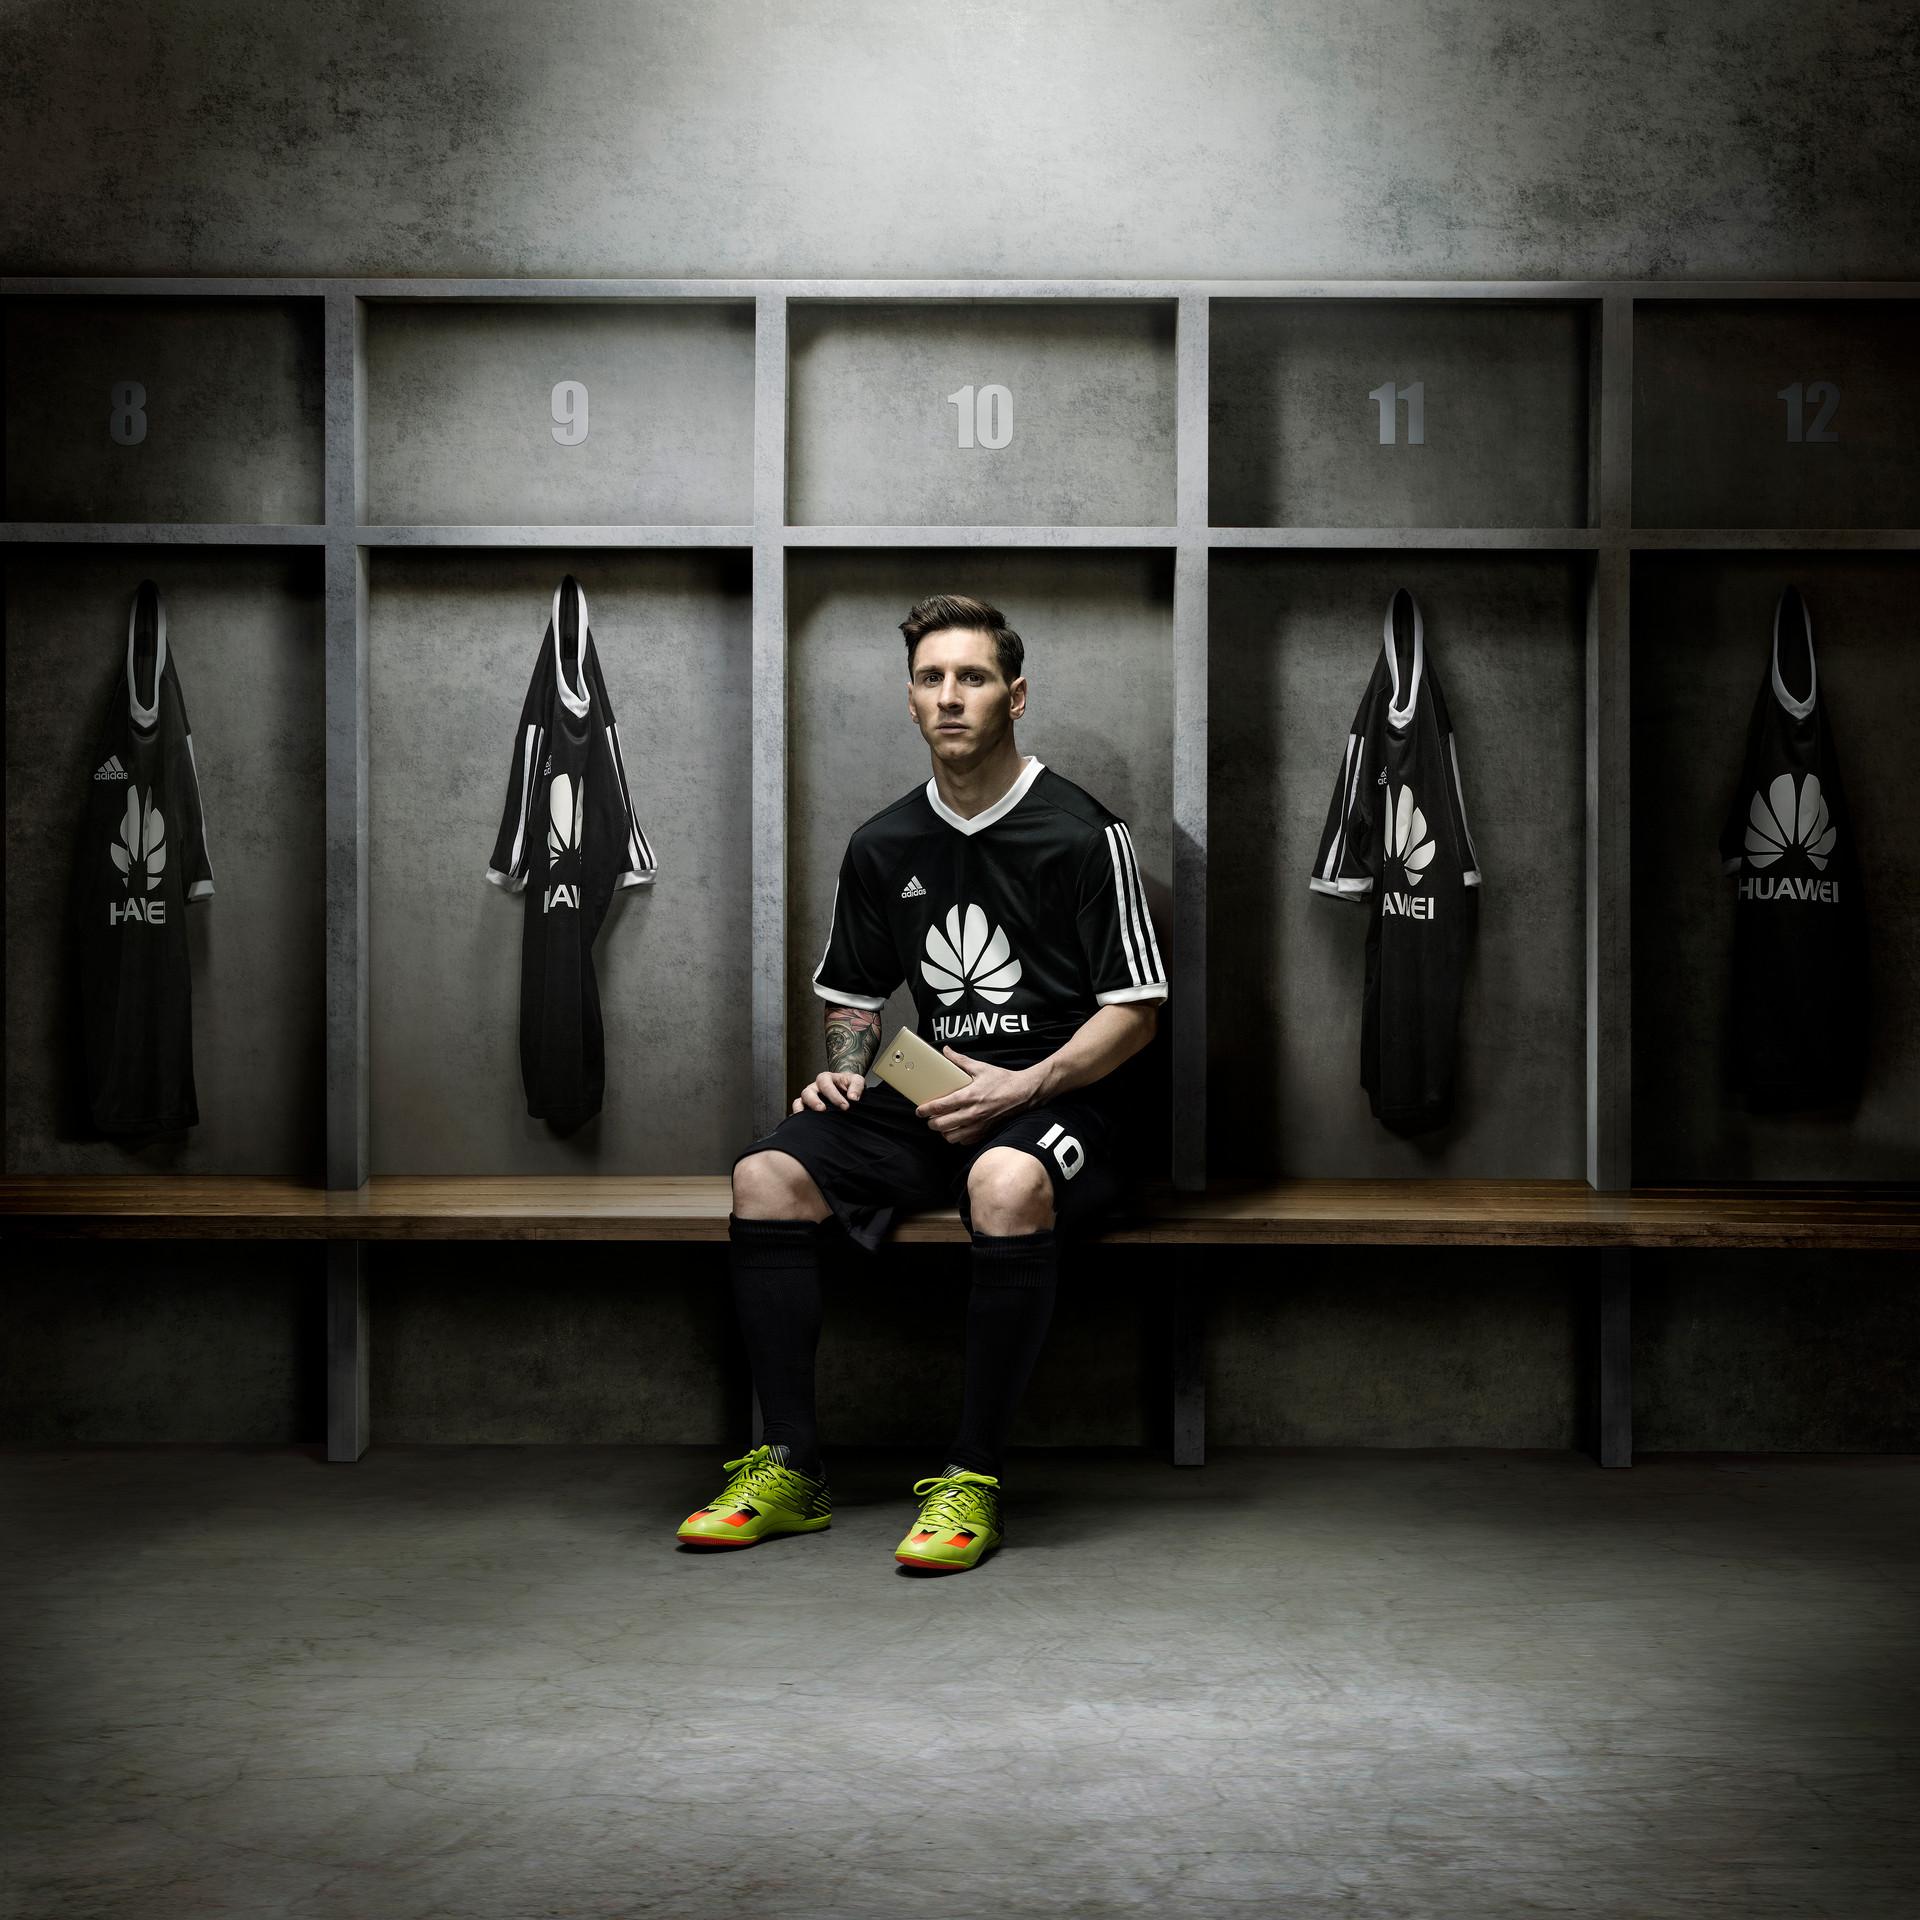 HUAWEI Messi VESTIDOR 20-5.jpg